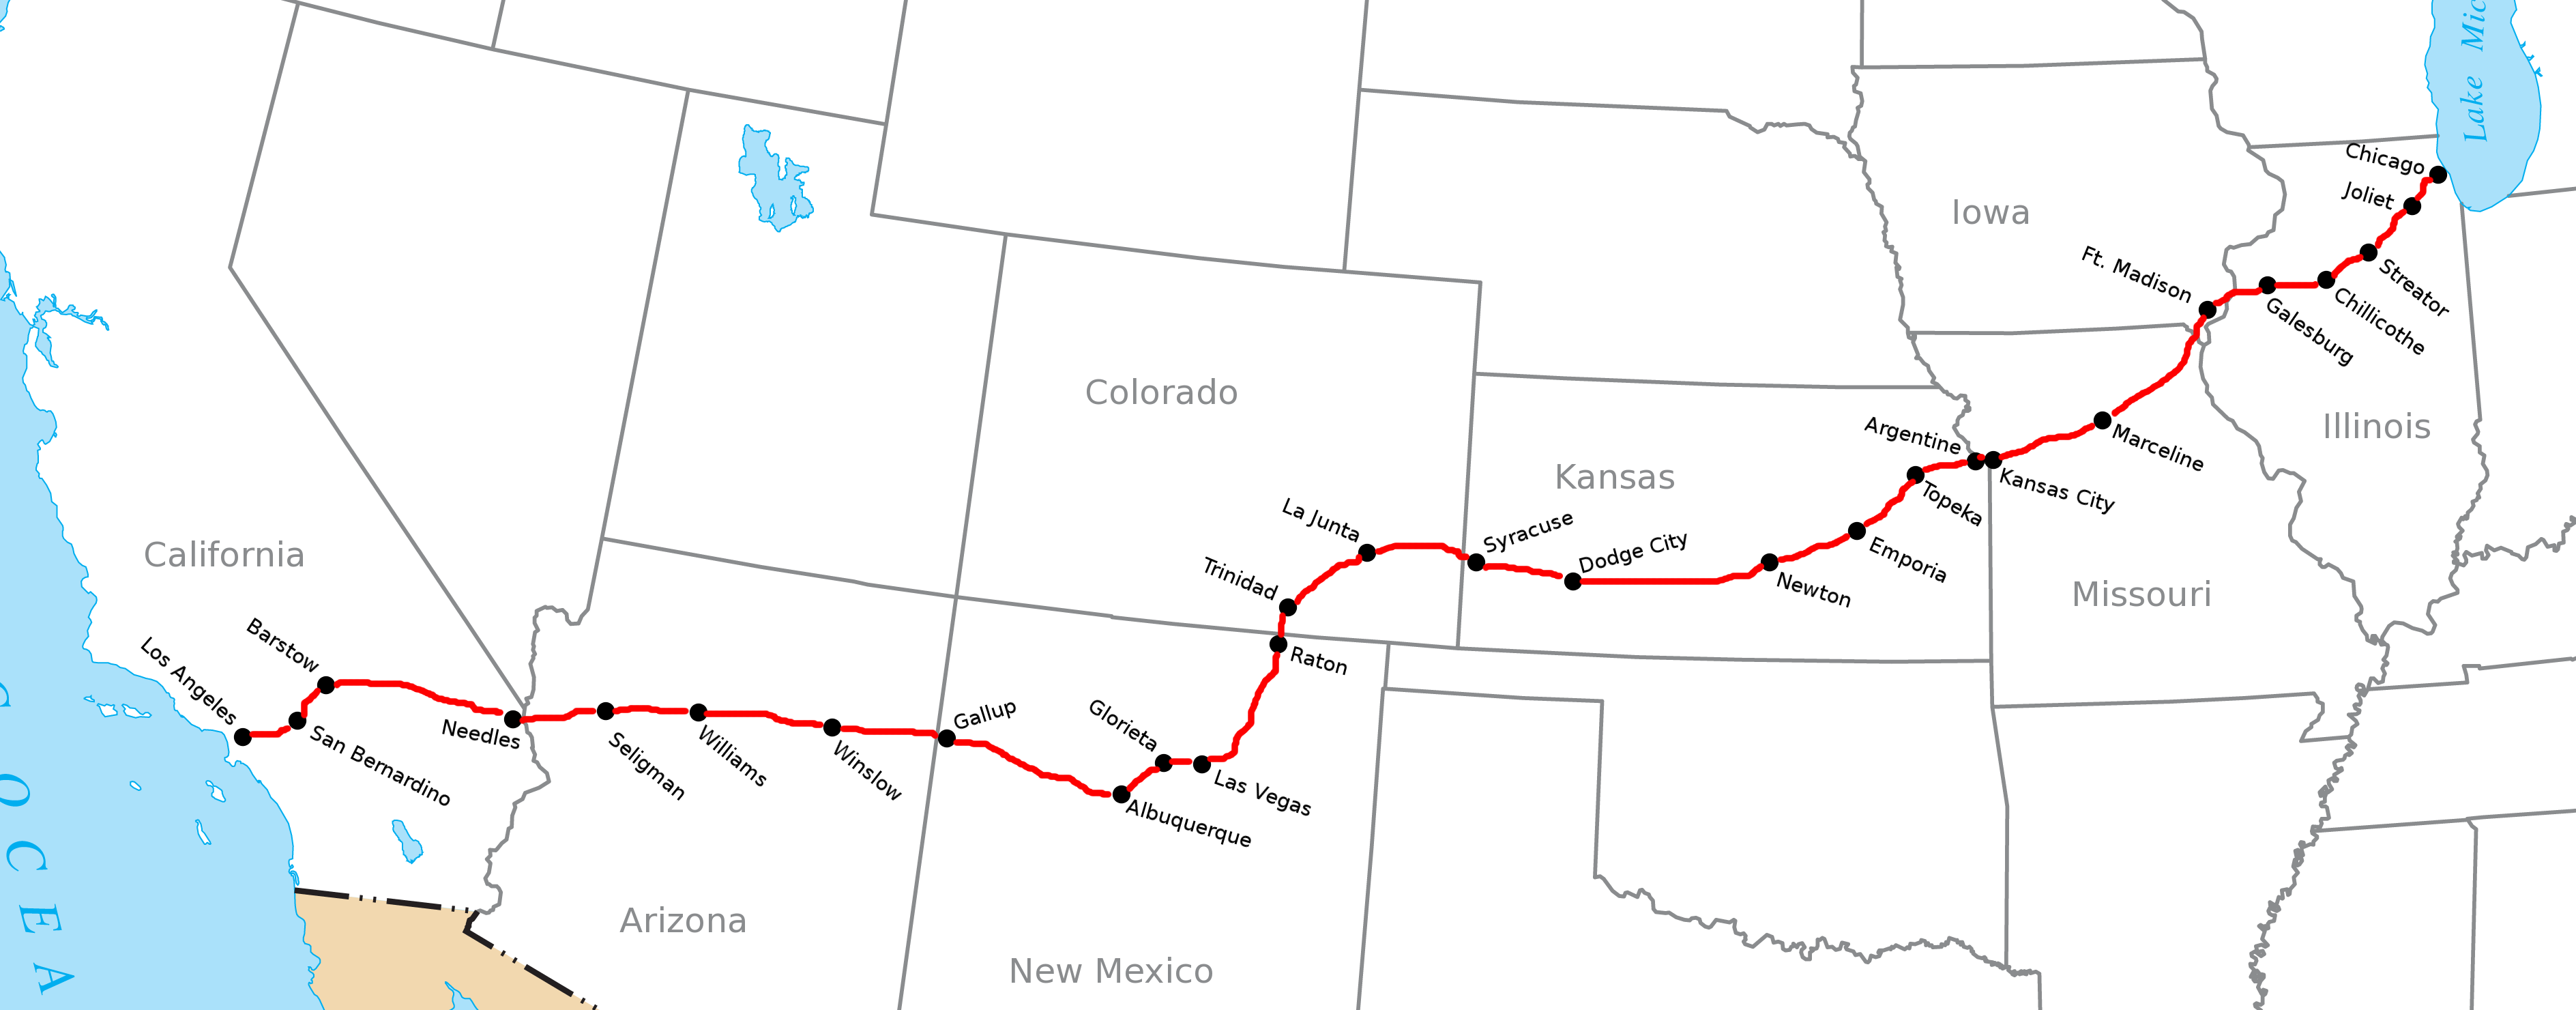 Santa Fe Railroad Route Map Swimnovacom - Atchinson topeka and santa ferailroad on the us map